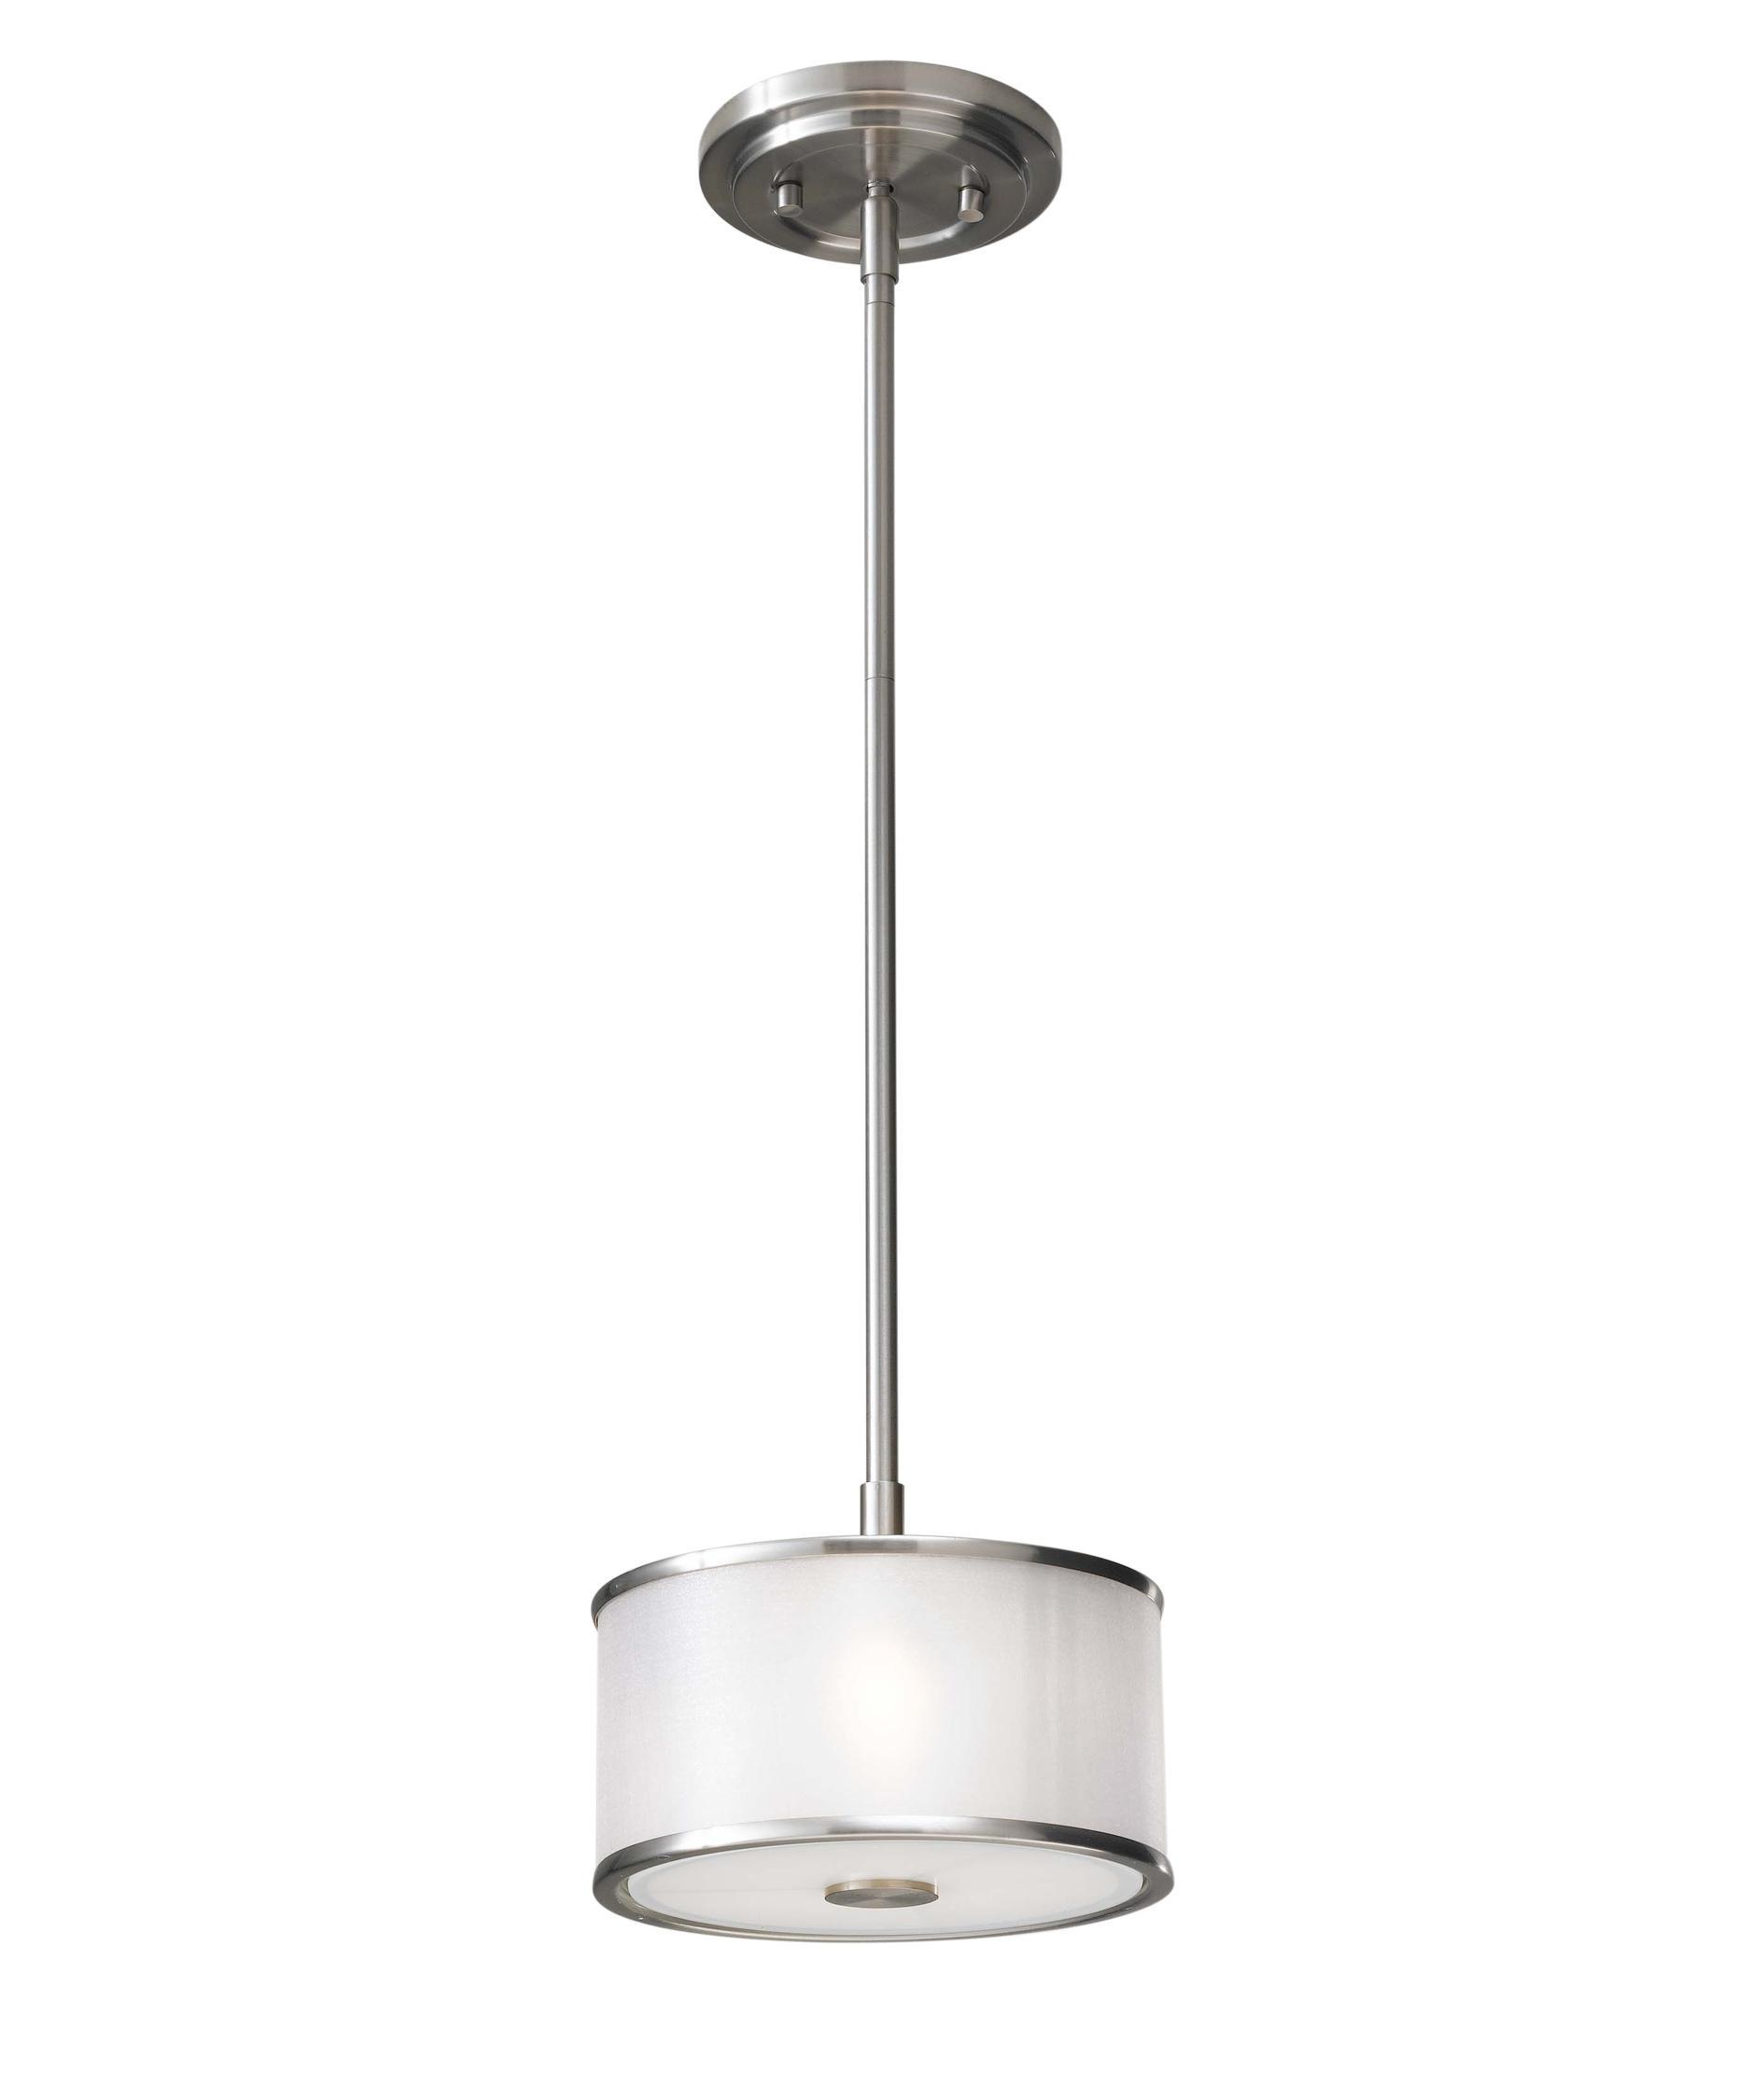 Murray Feiss Bathroom Lighting: Murray Feiss P1137 Casual Luxury 8 Inch Mini Pendant